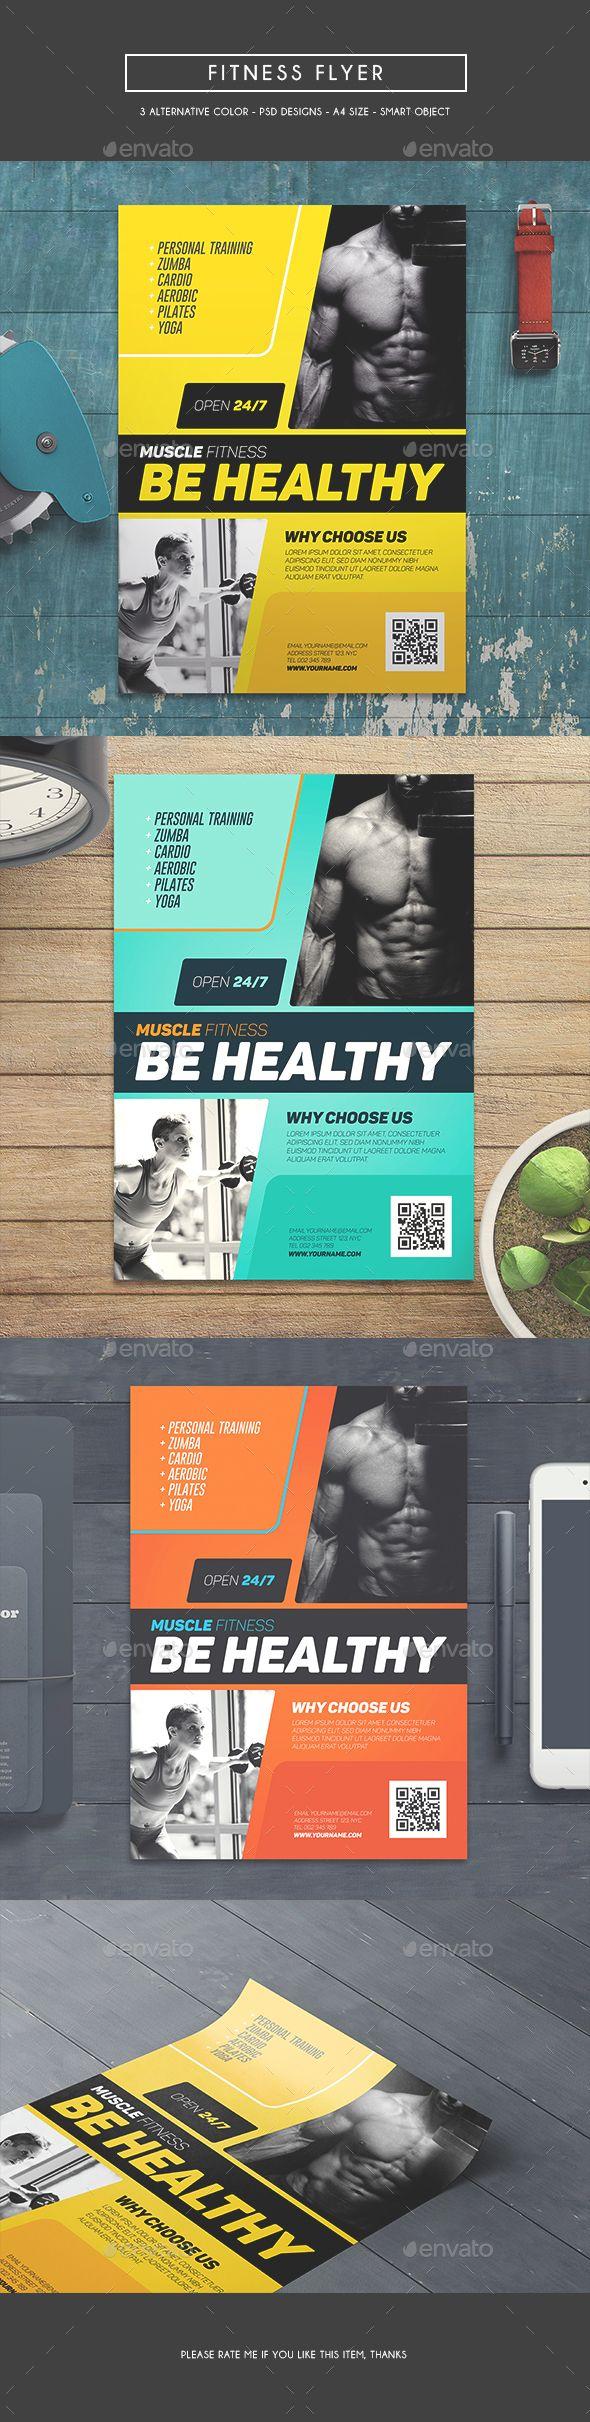 Fitness Flyer Template PSD. Download here: http://graphicriver.net/item/fitness-flyer/16858125?ref=ksioks